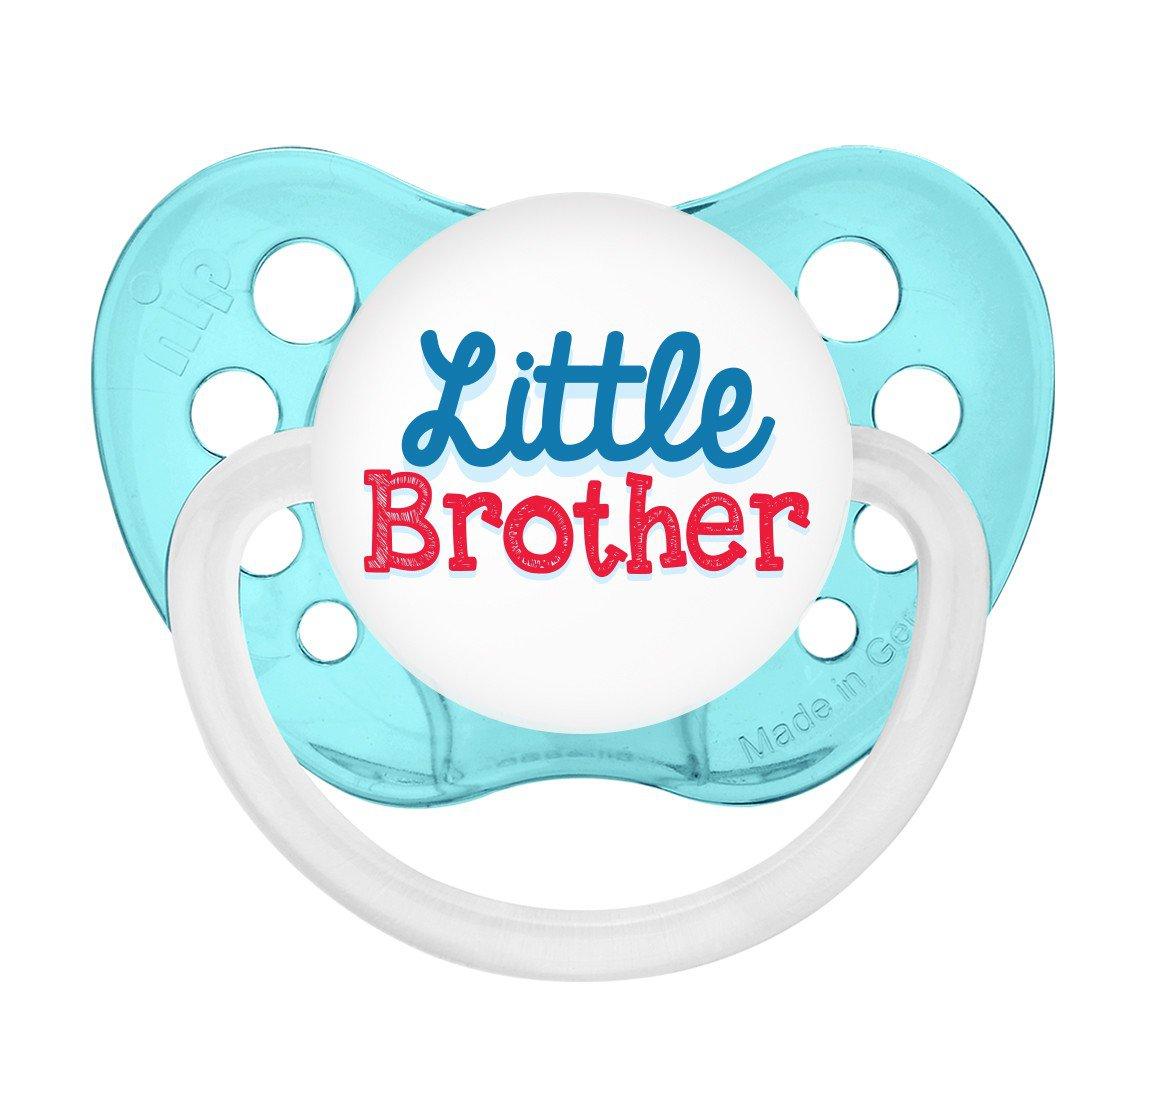 Little Brother Pacifier - 0-6 months - Boys - Ulubulu - Aqua Blue